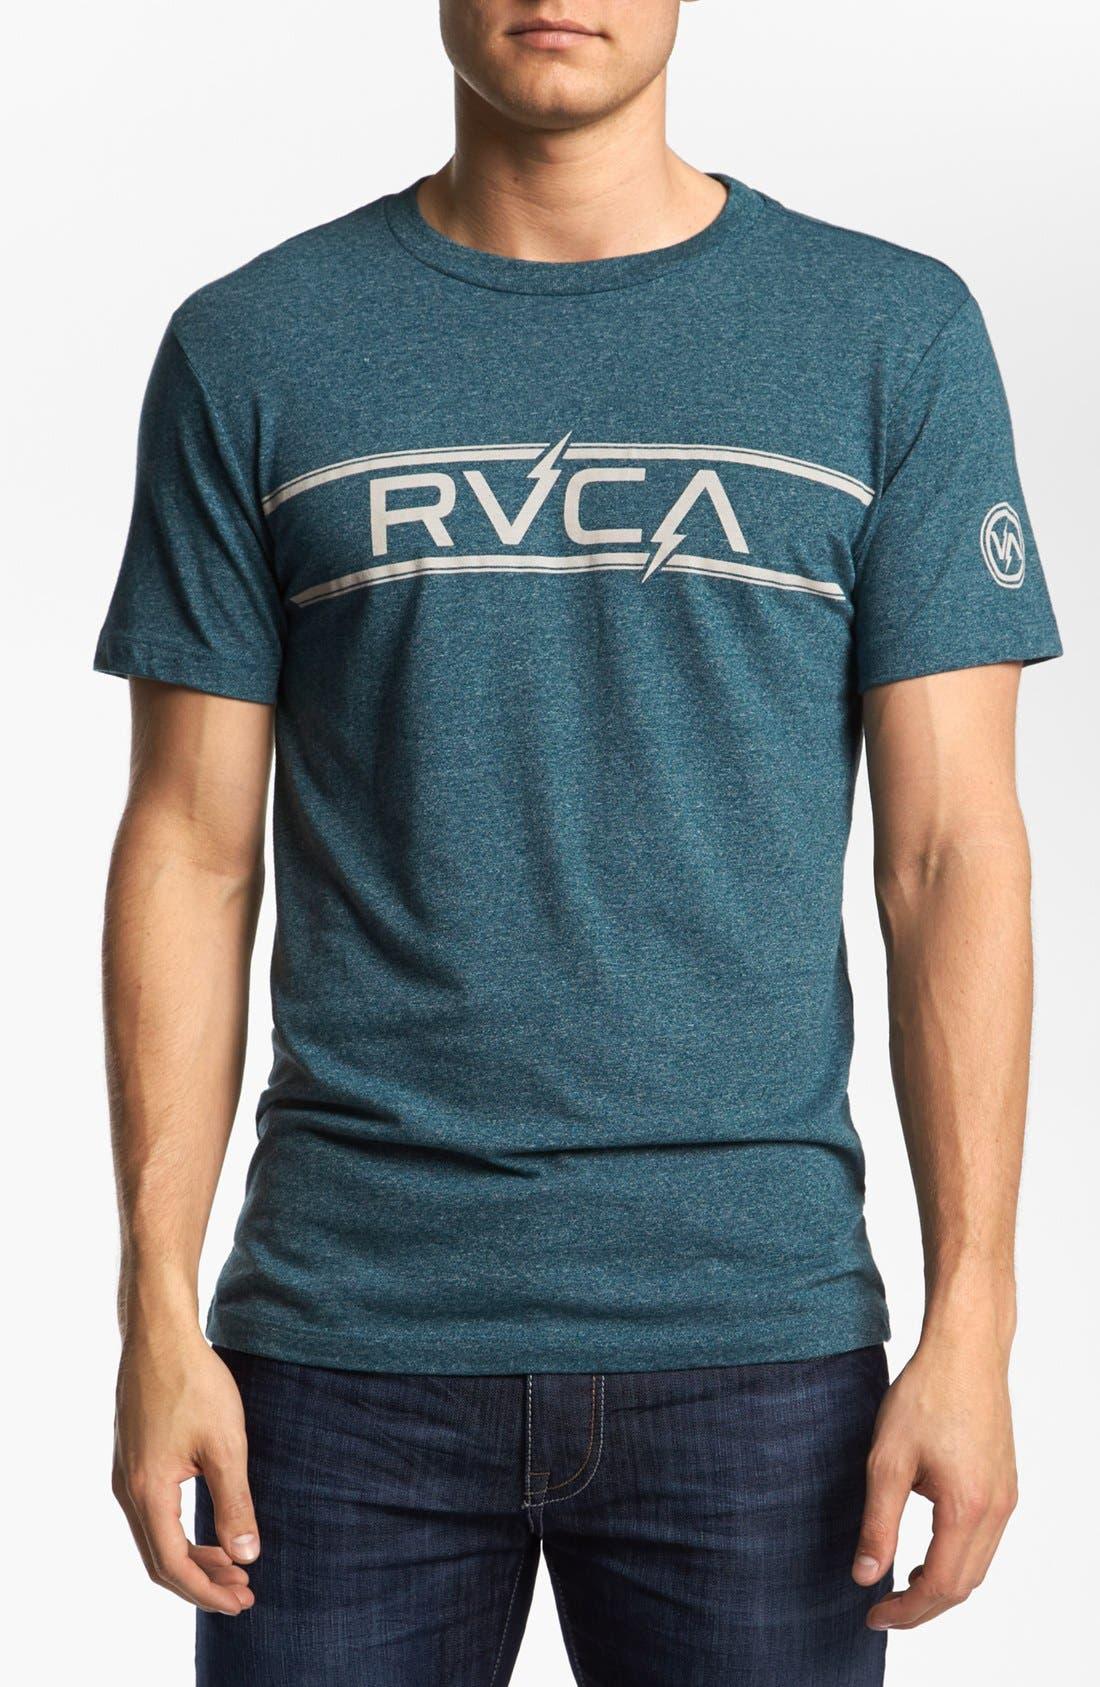 Main Image - RVCA 'Bolts' T-Shirt